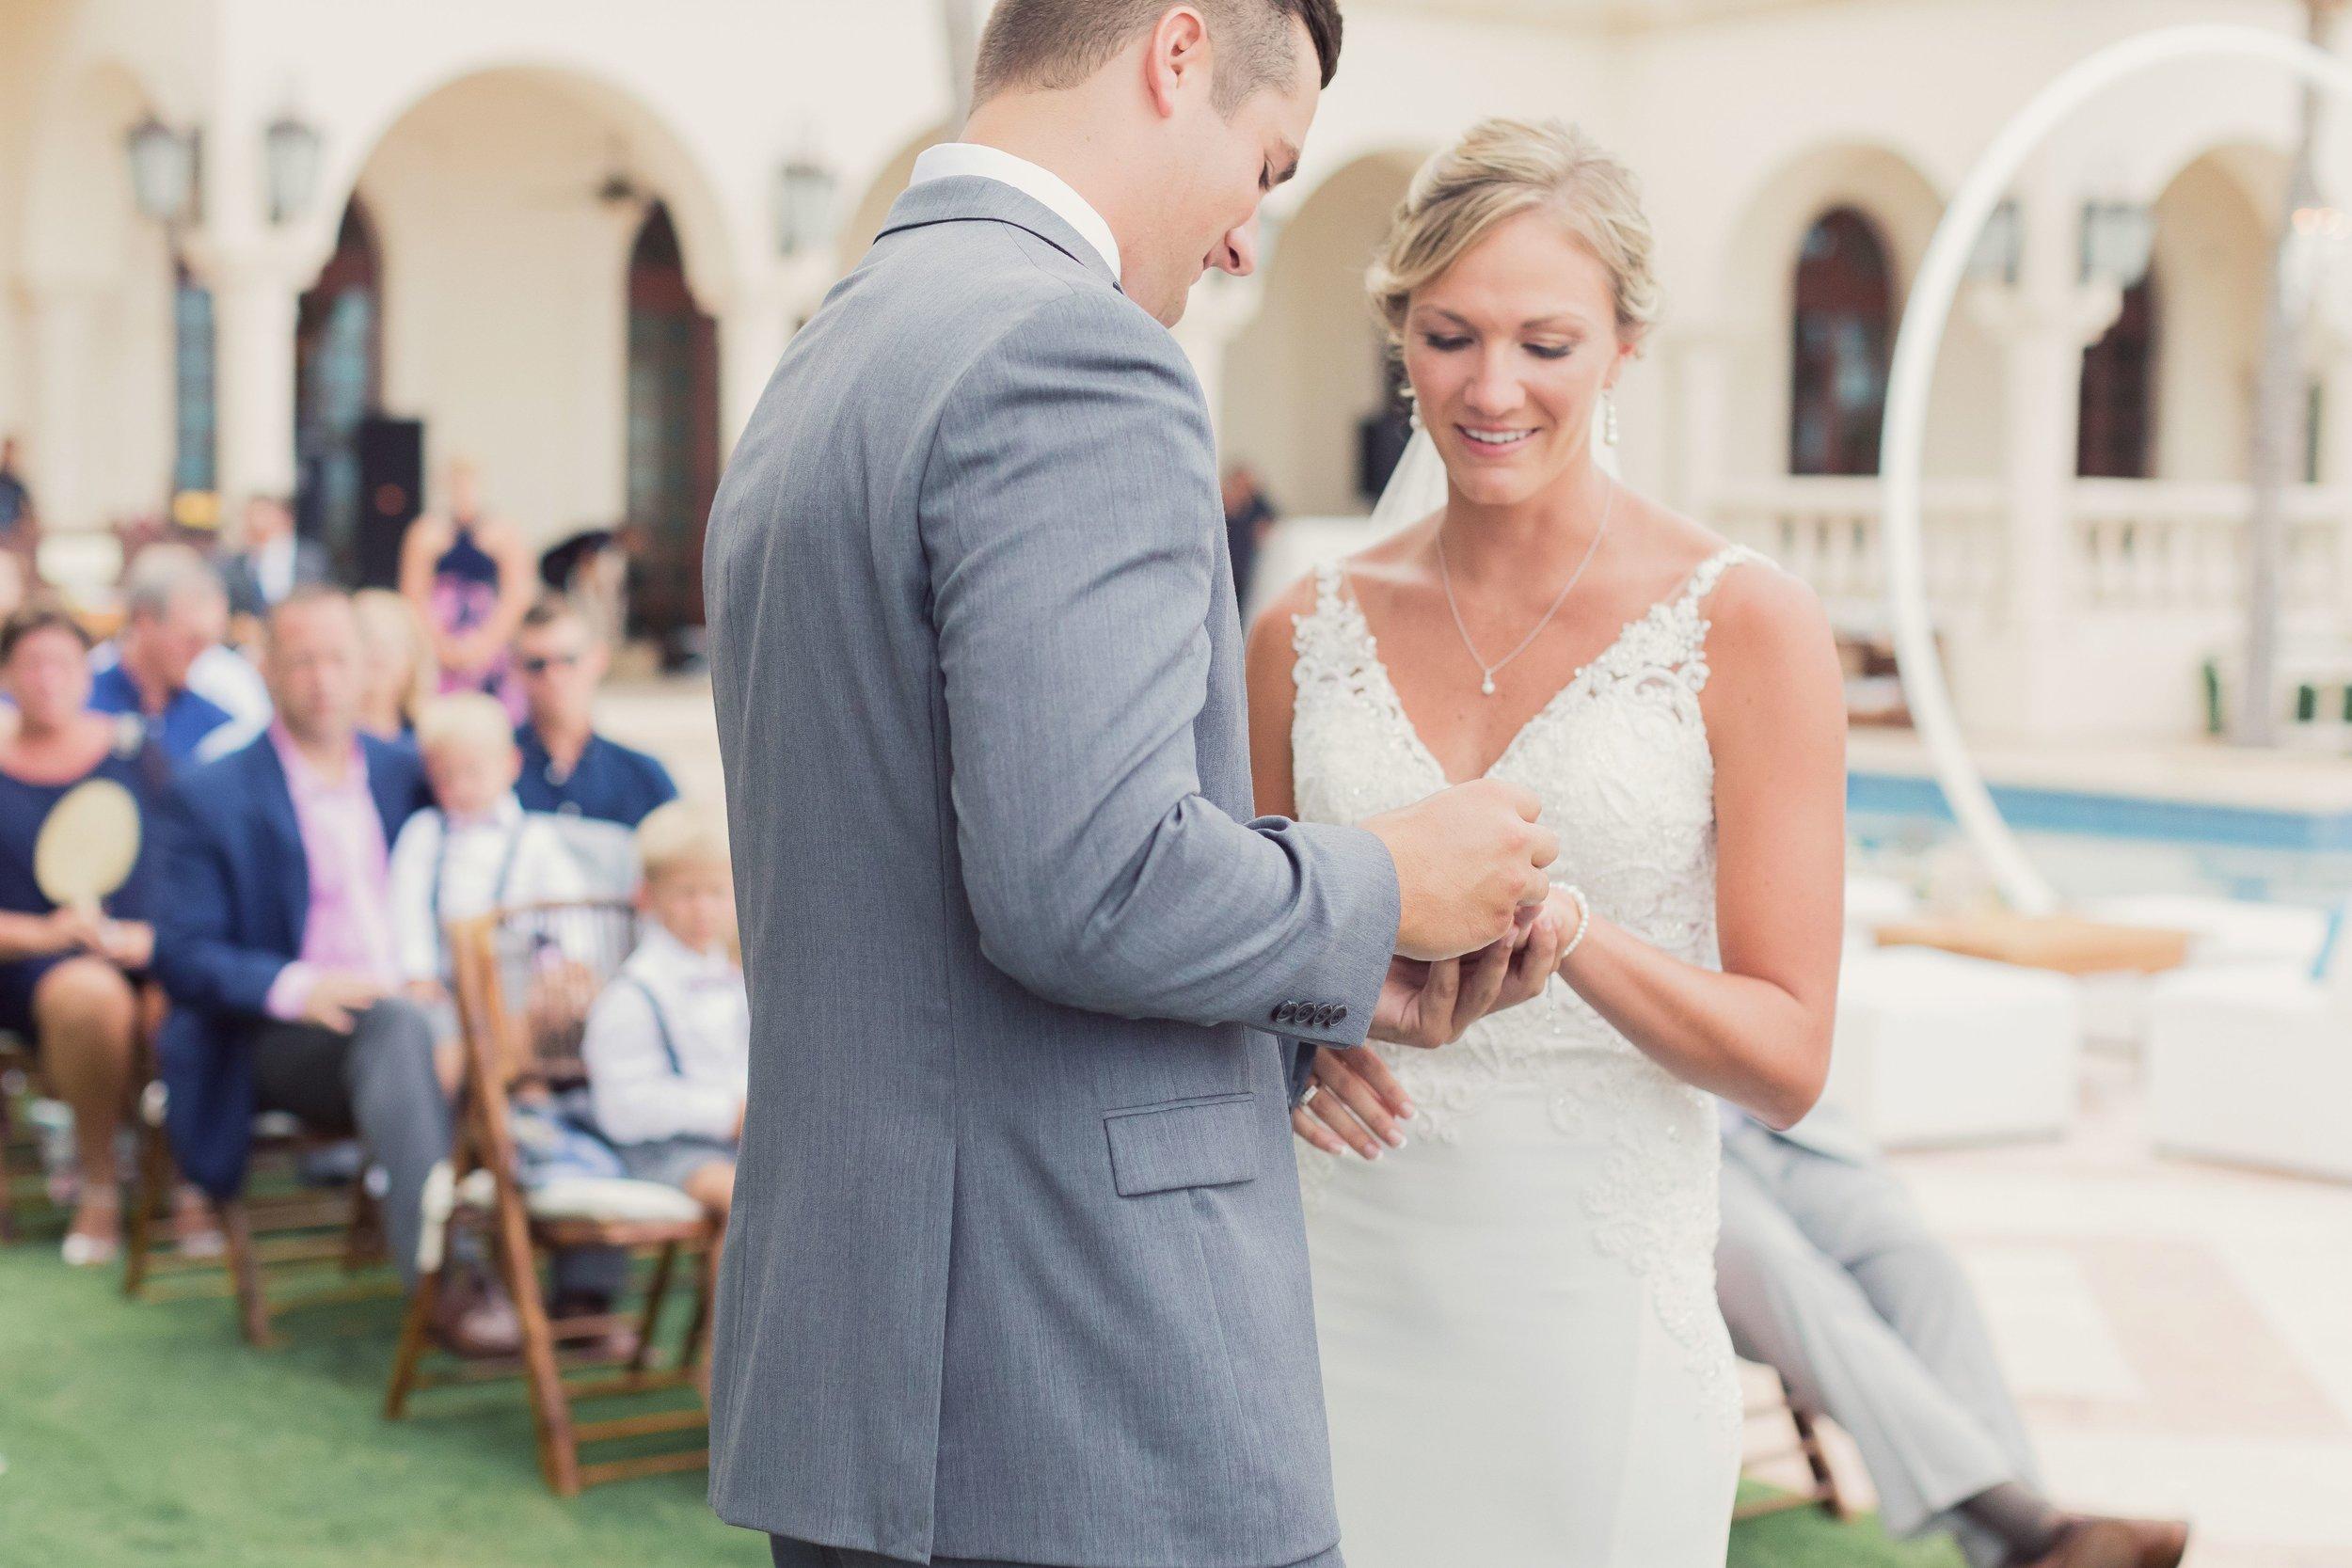 cancun-wedding-venue-villa-la-joya-927 copy-websize.jpg